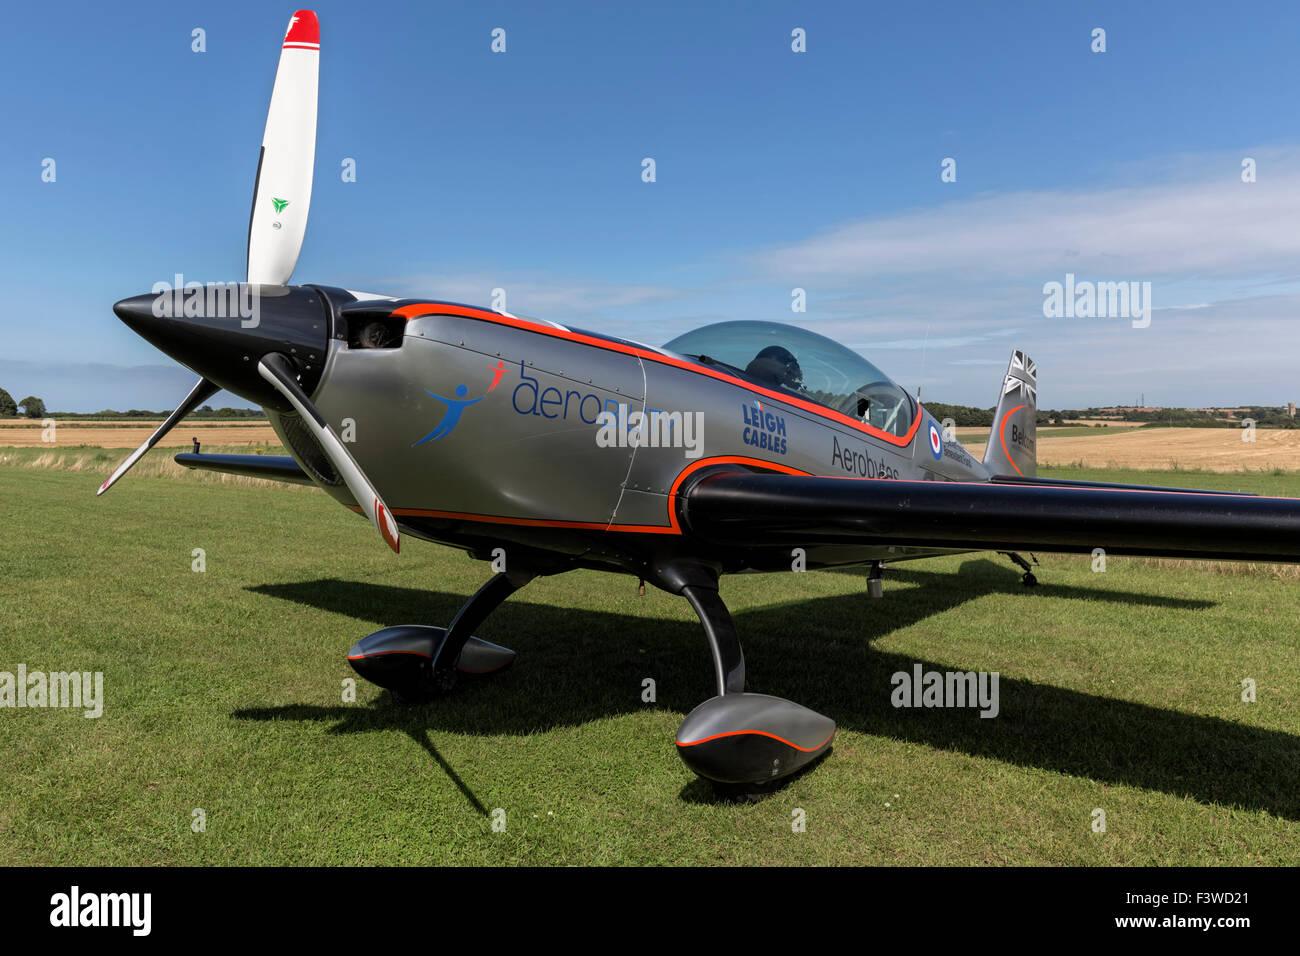 The Blades aerobatic team - Blade Two - Extra Flugzeugbau E300 - Stock Image